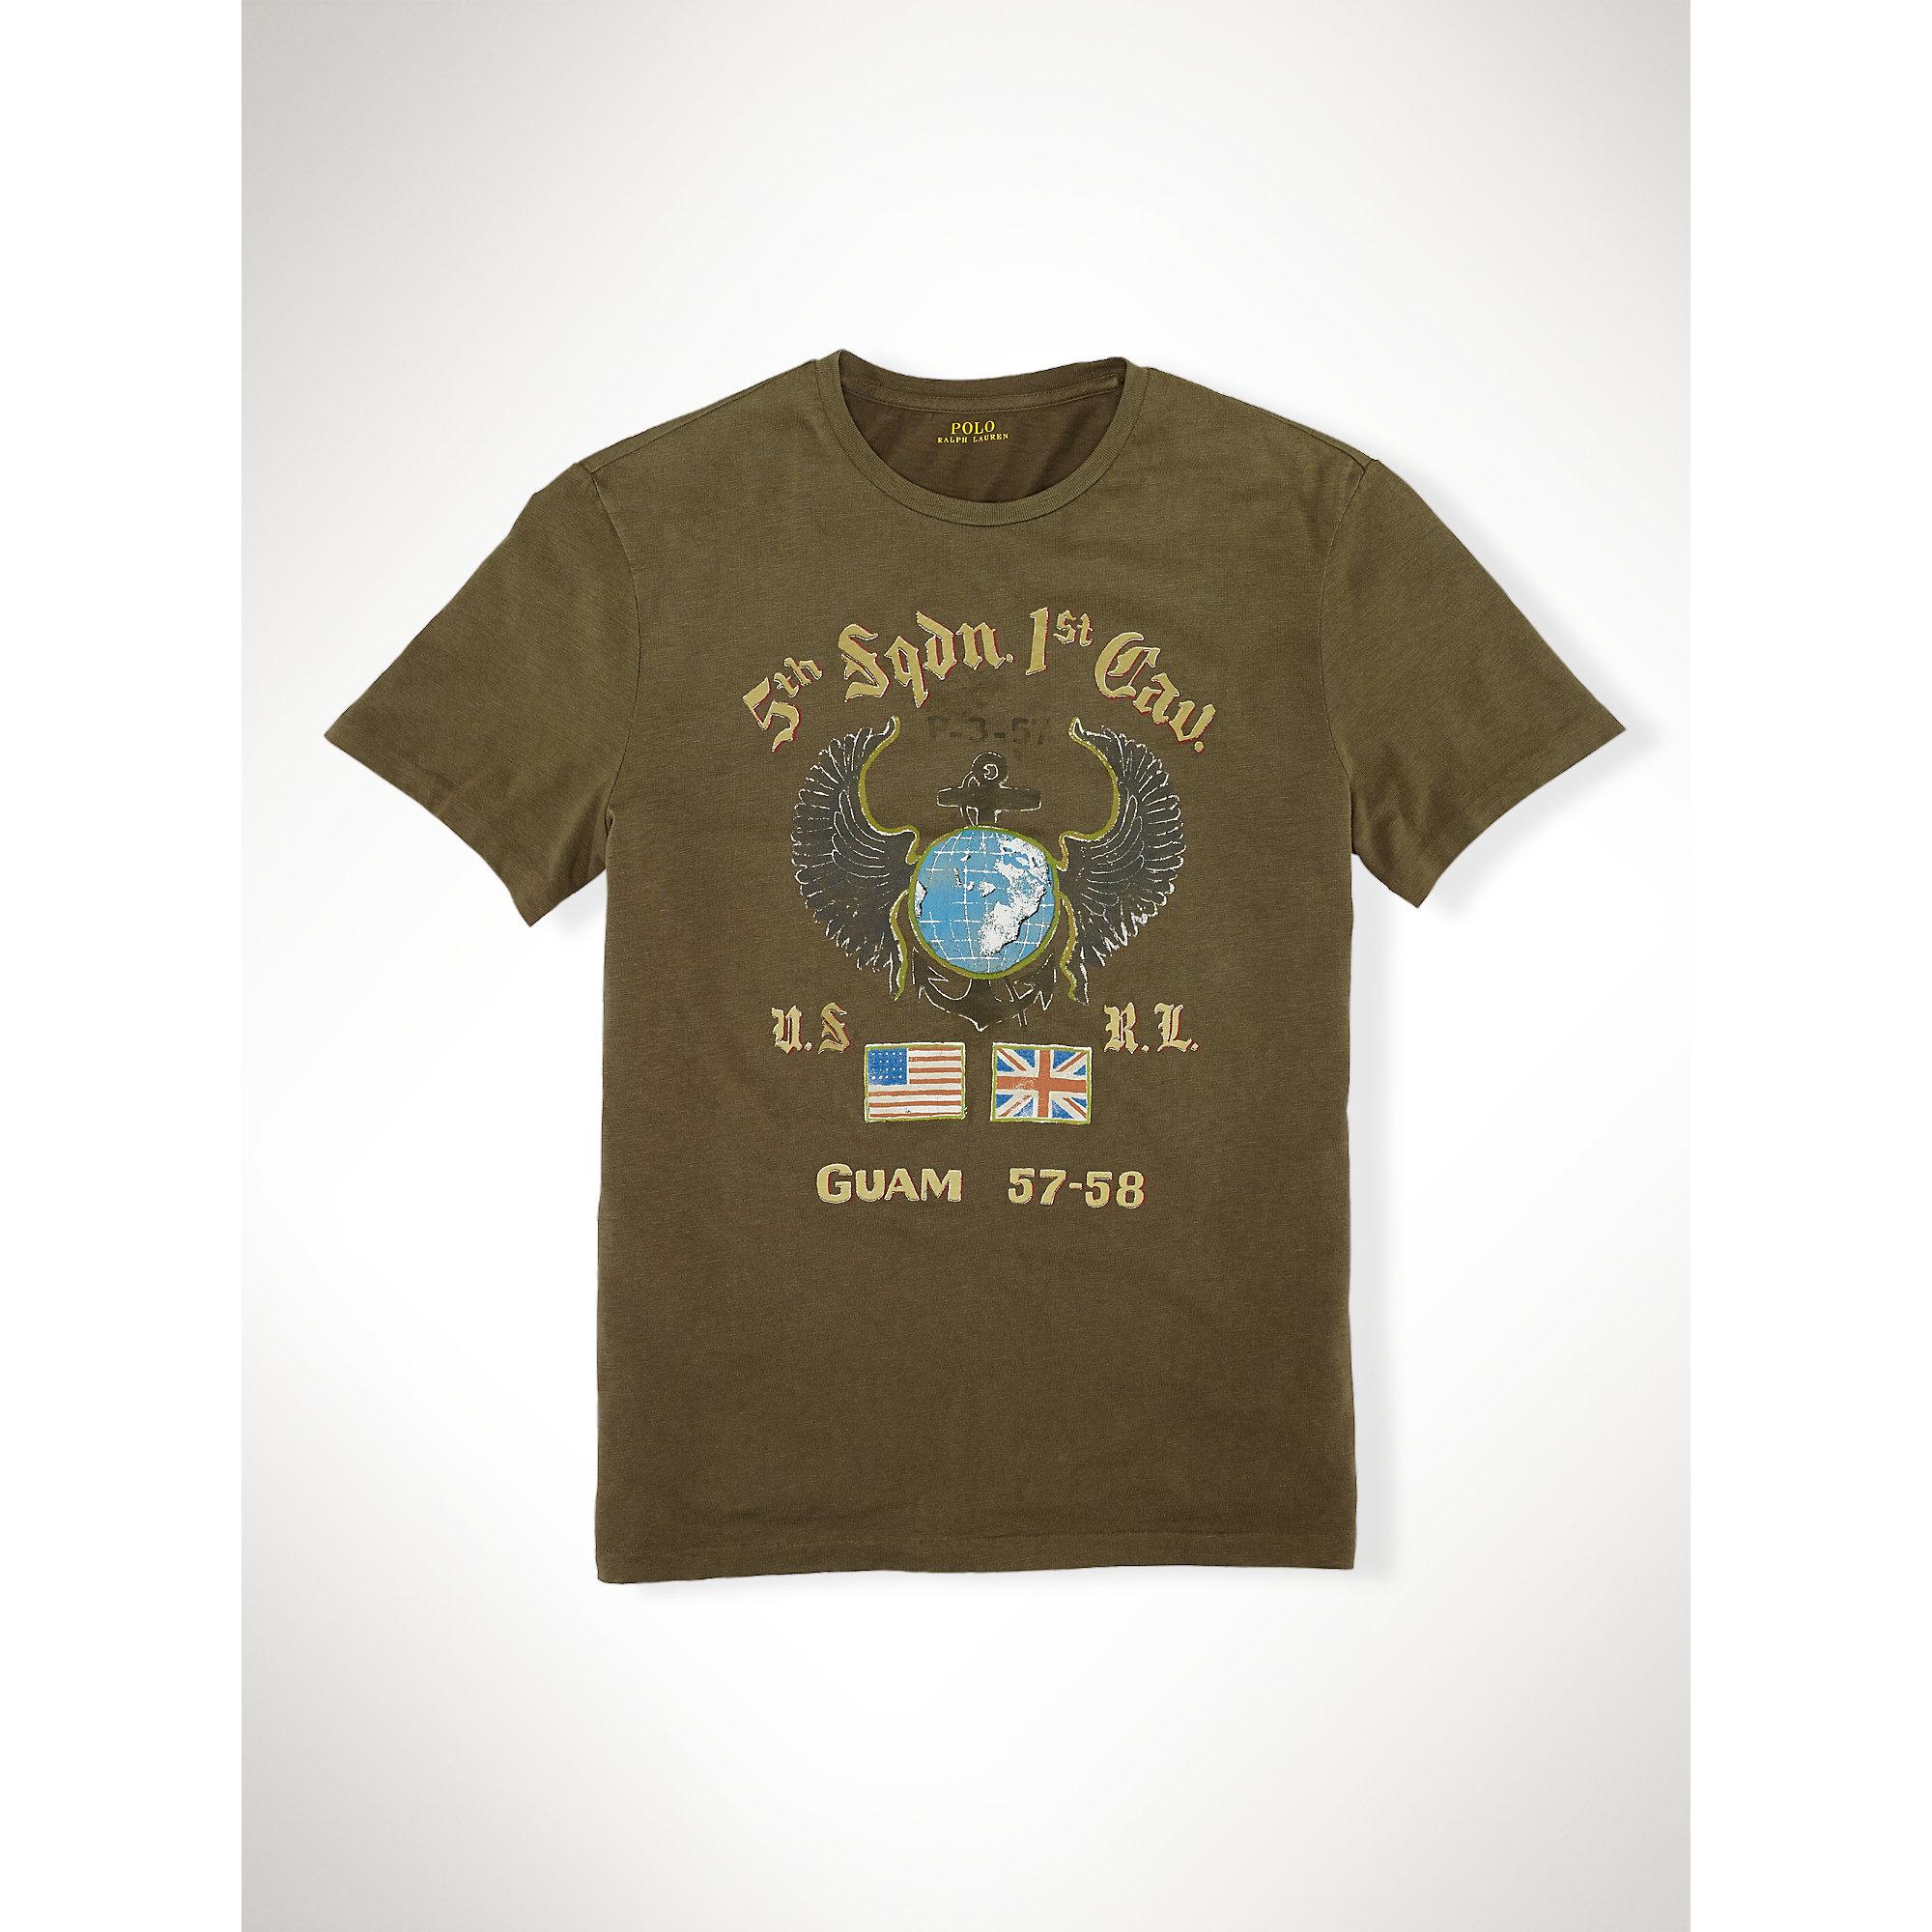 fb96f3d6978b8 Lyst - Polo Ralph Lauren Custom-fit Eagle Wing T-shirt in Green for Men